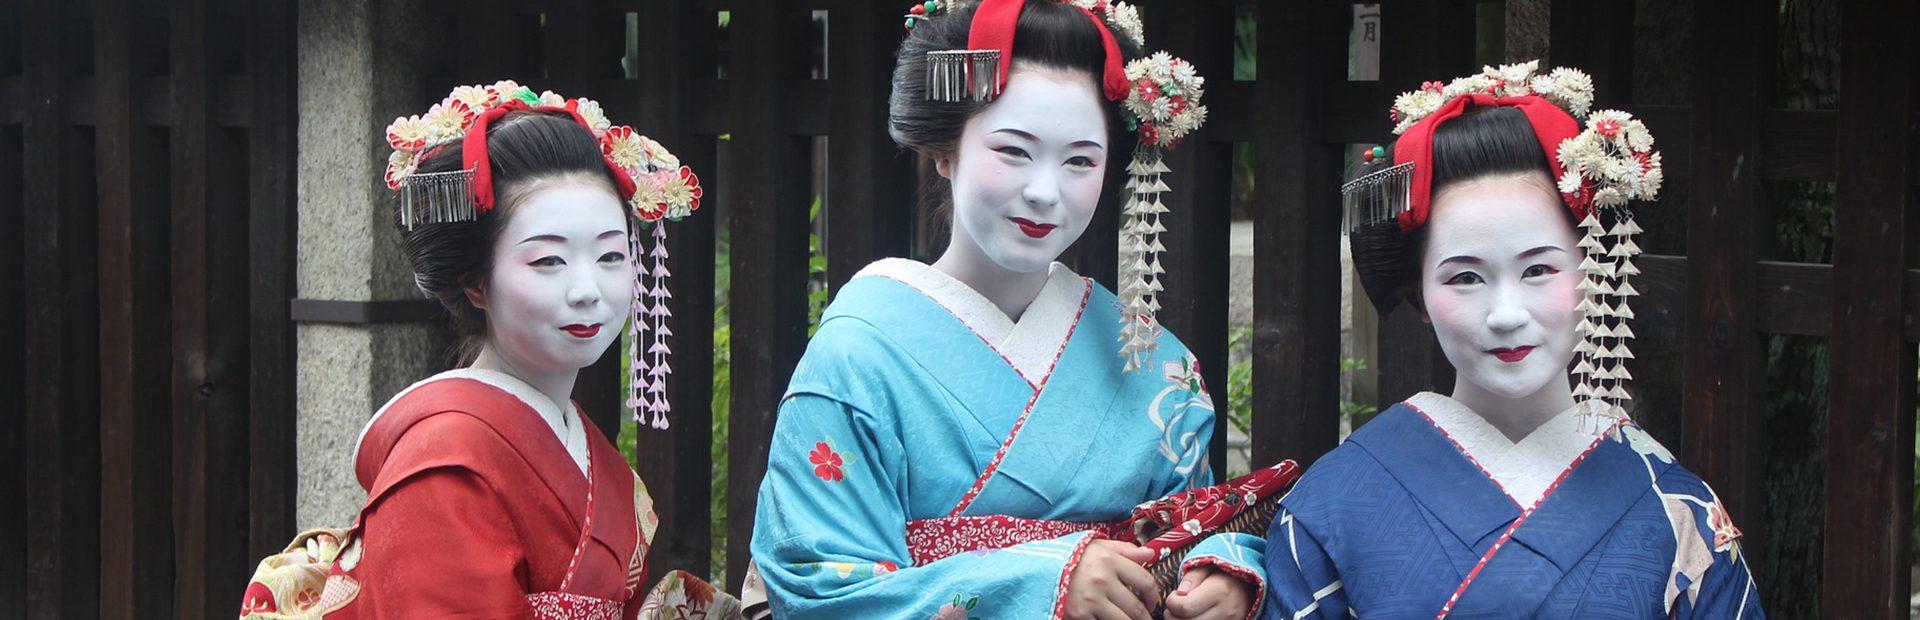 japan bouwstenen